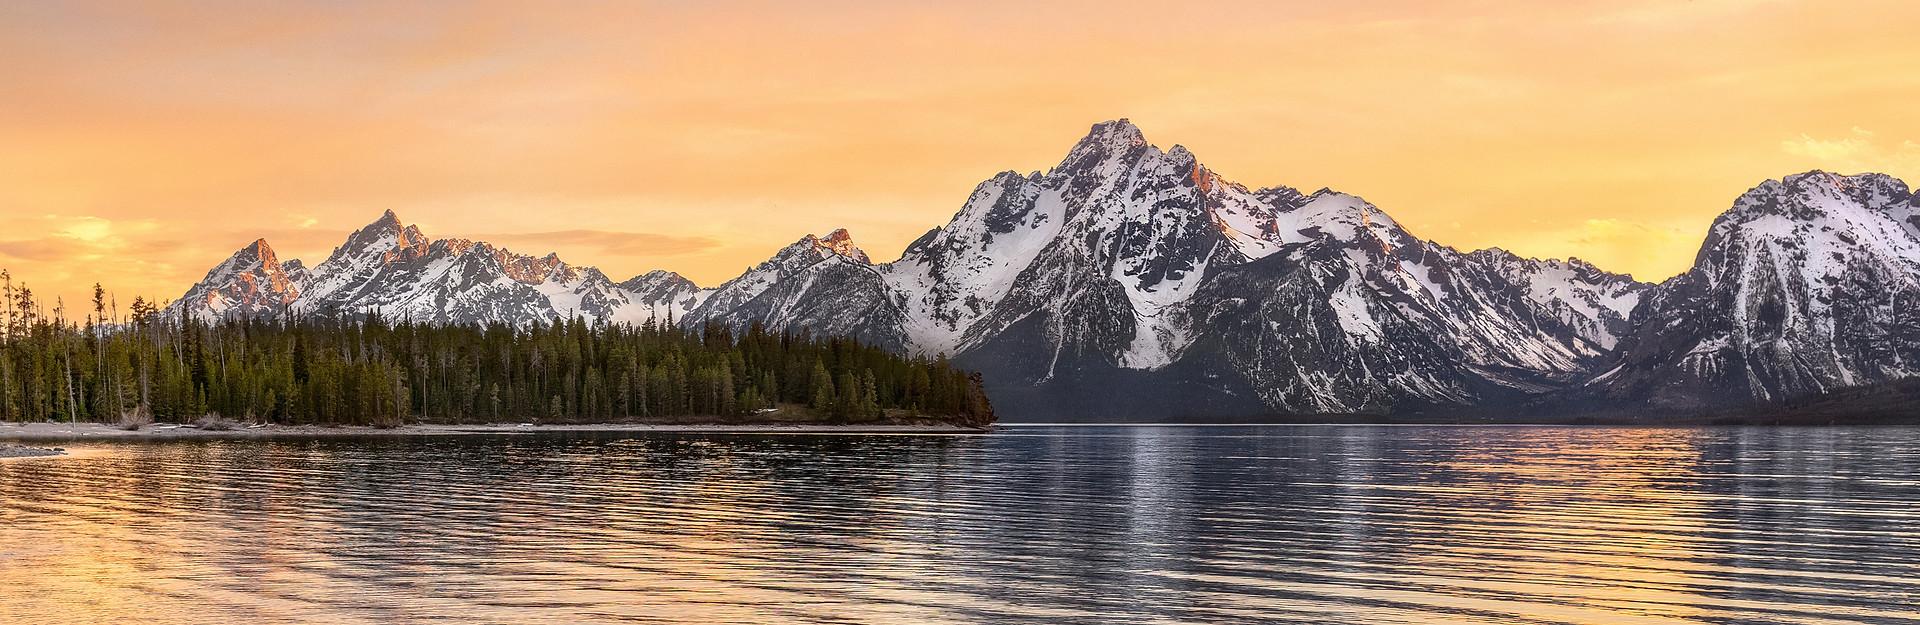 Grand Teton National Park - Panorama